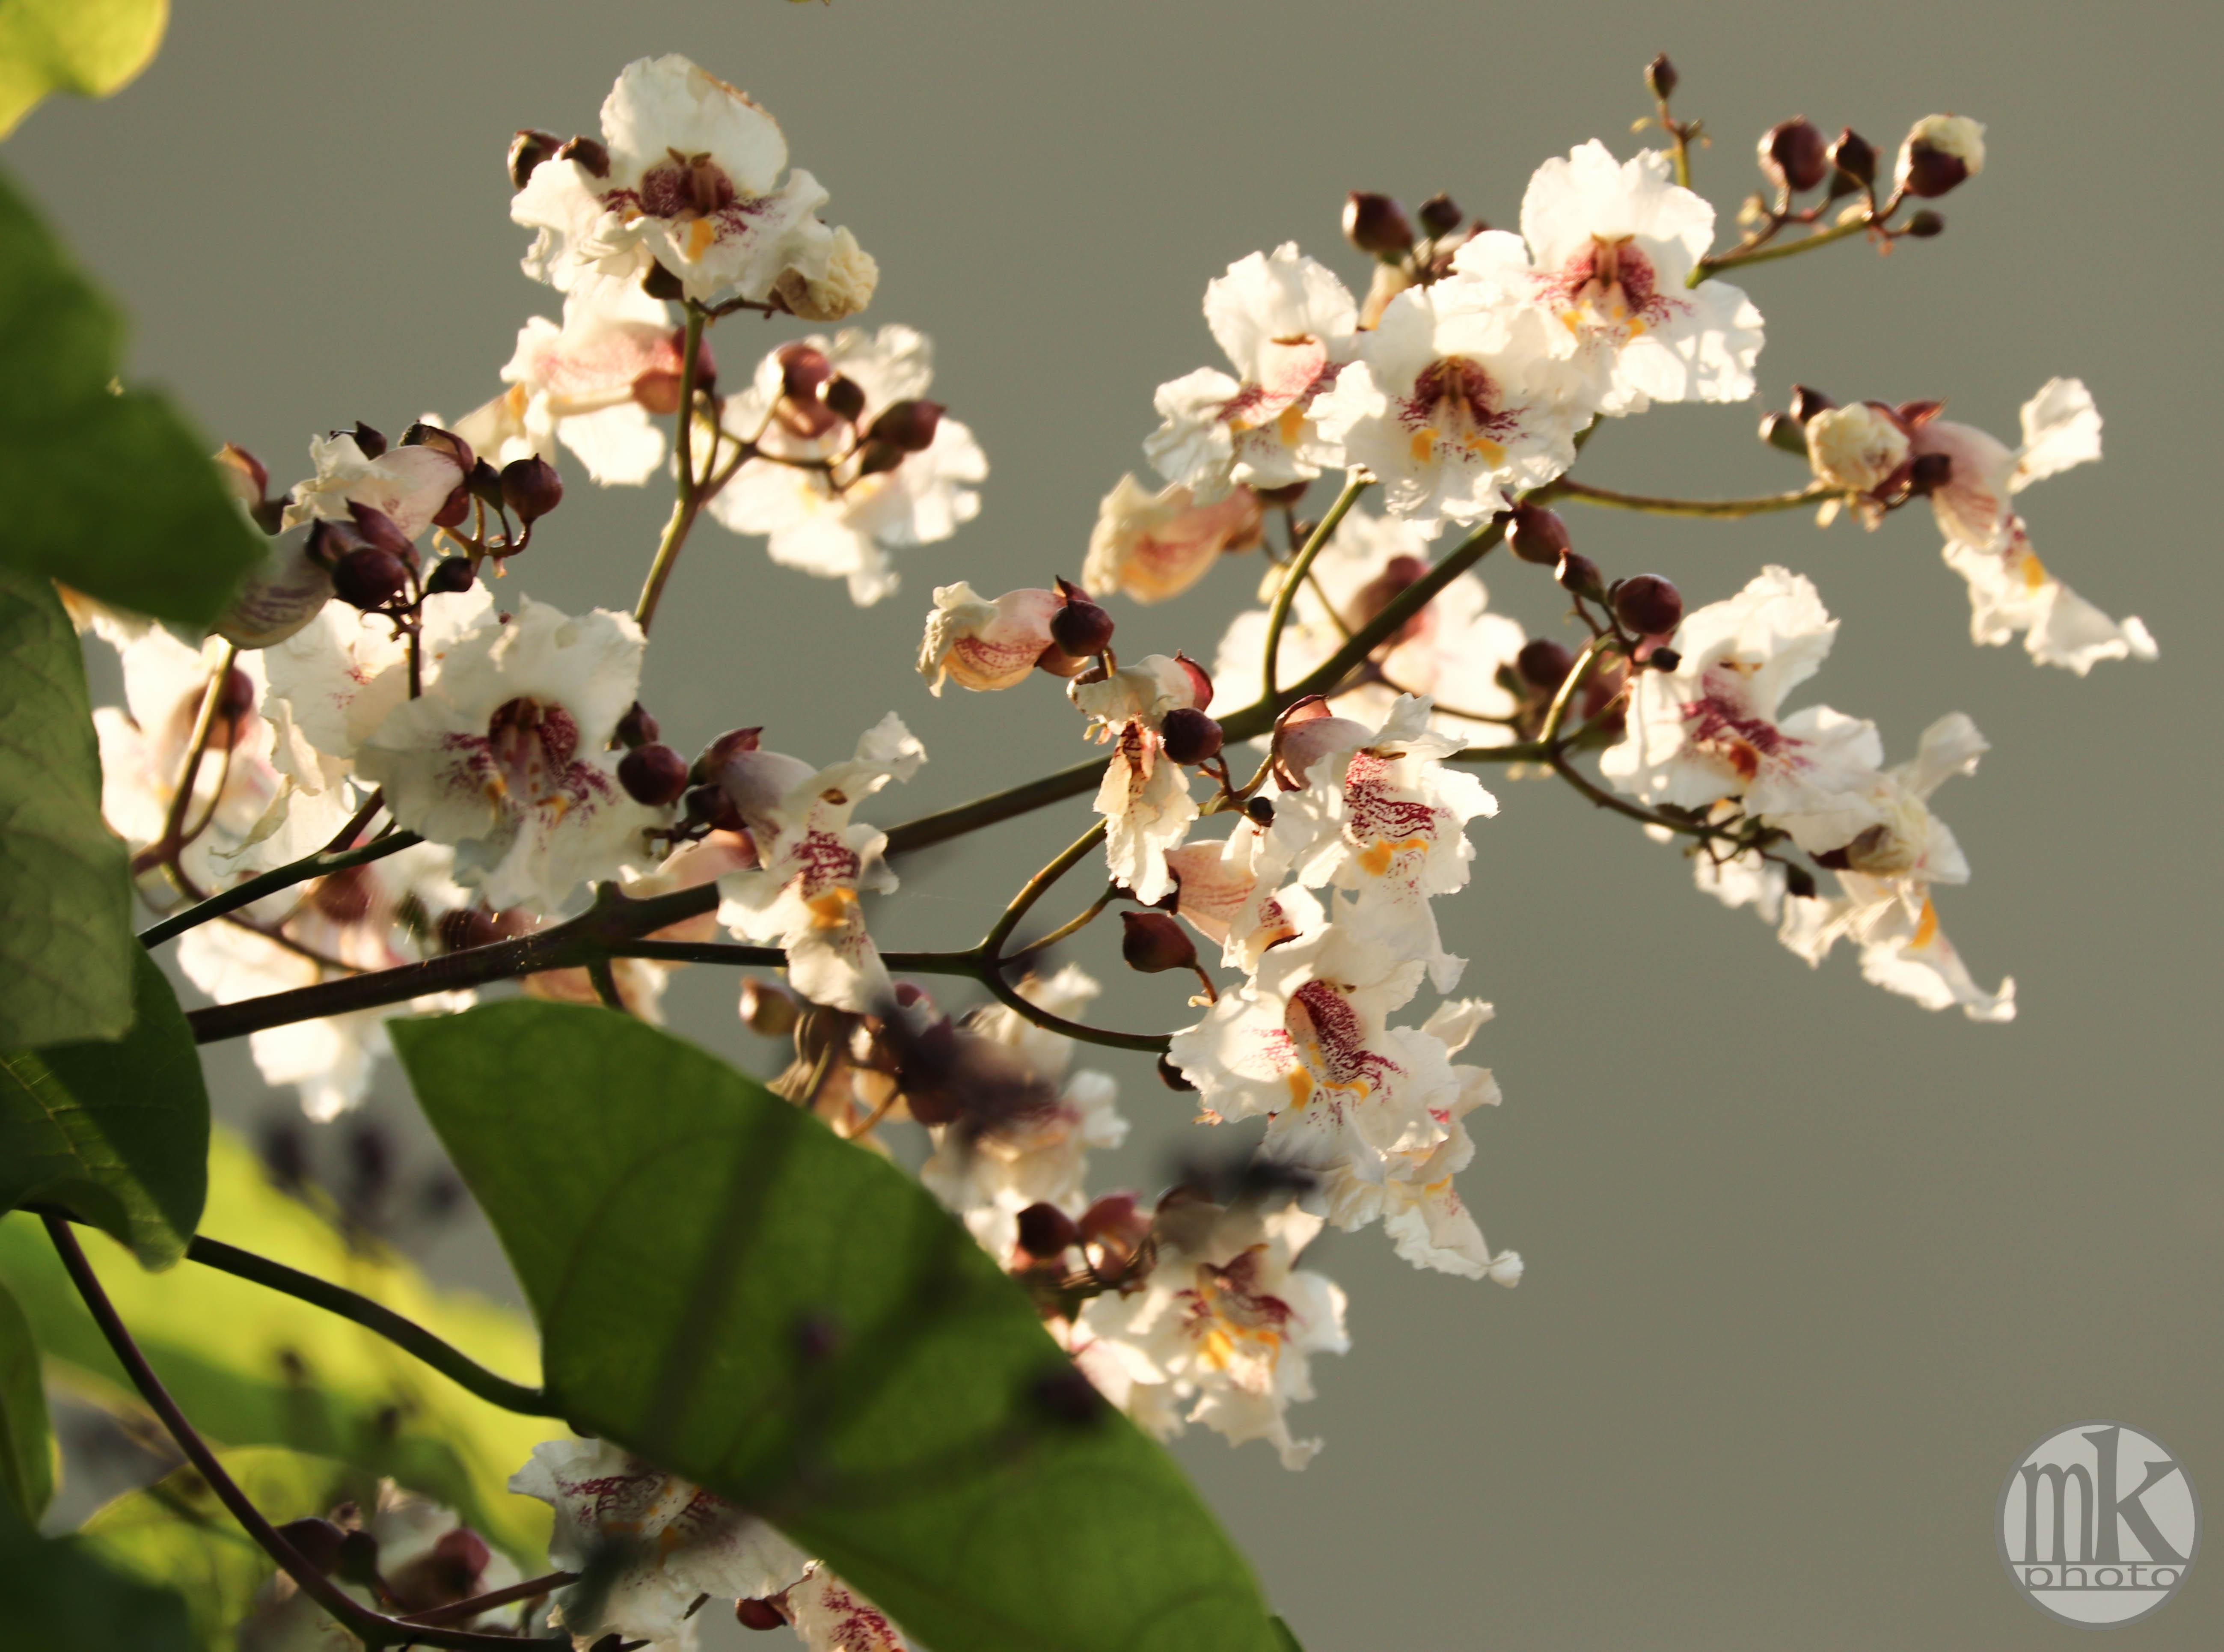 fleurs de catalpa, keranlay, 23 juin 20